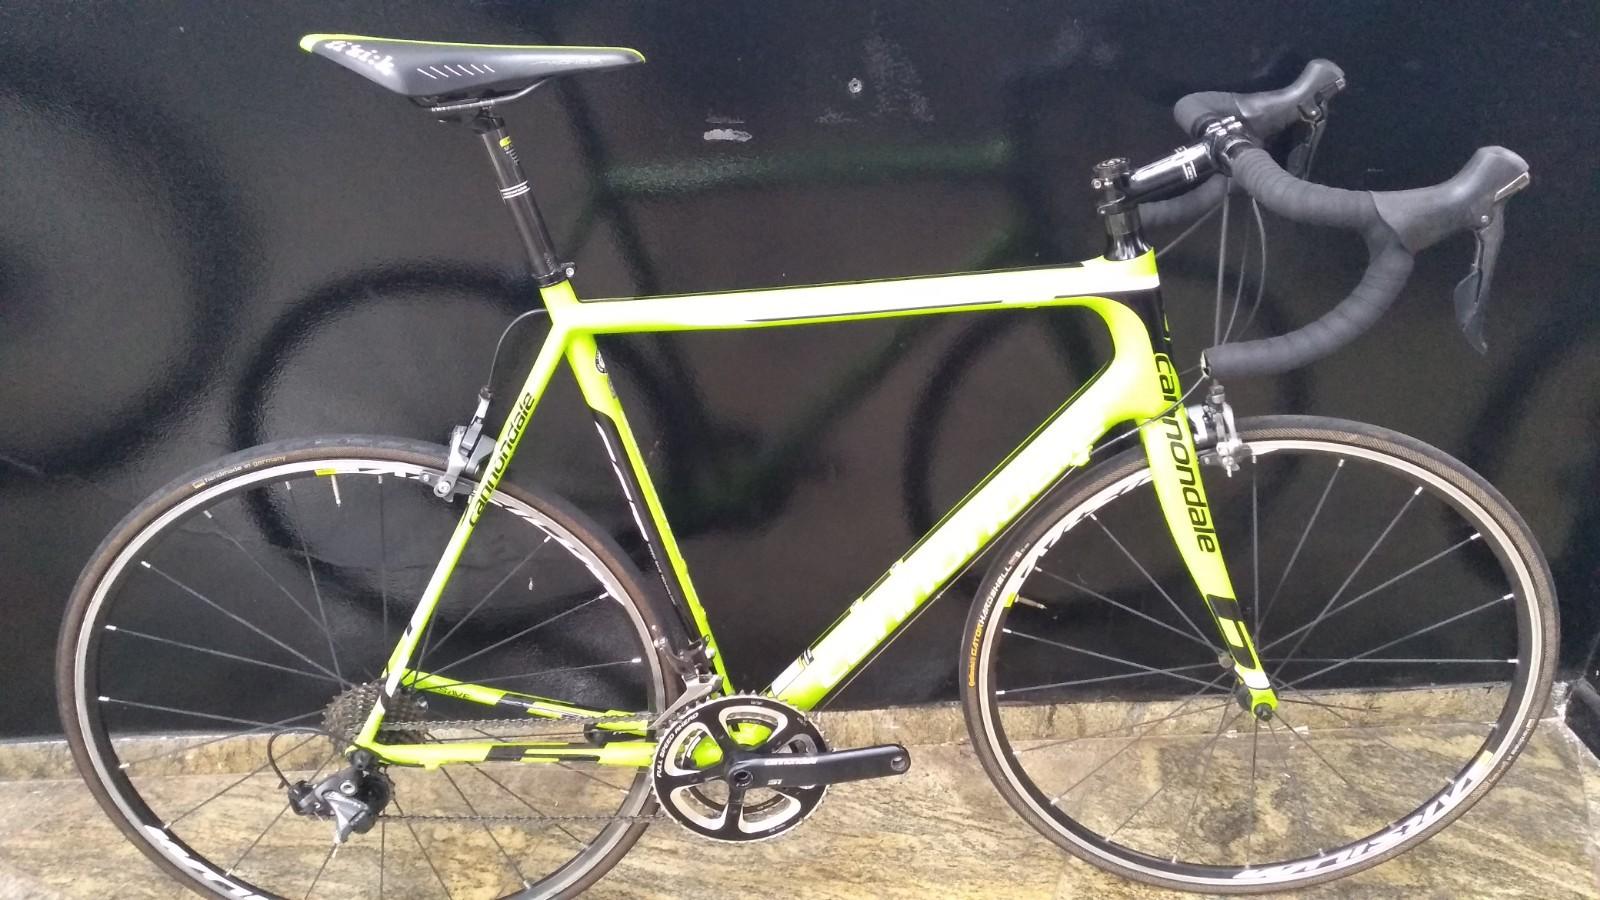 Bicicleta Cannondale SuperSix EVO 3 Ultegra 6800 - tamanho 58 (produto usado)